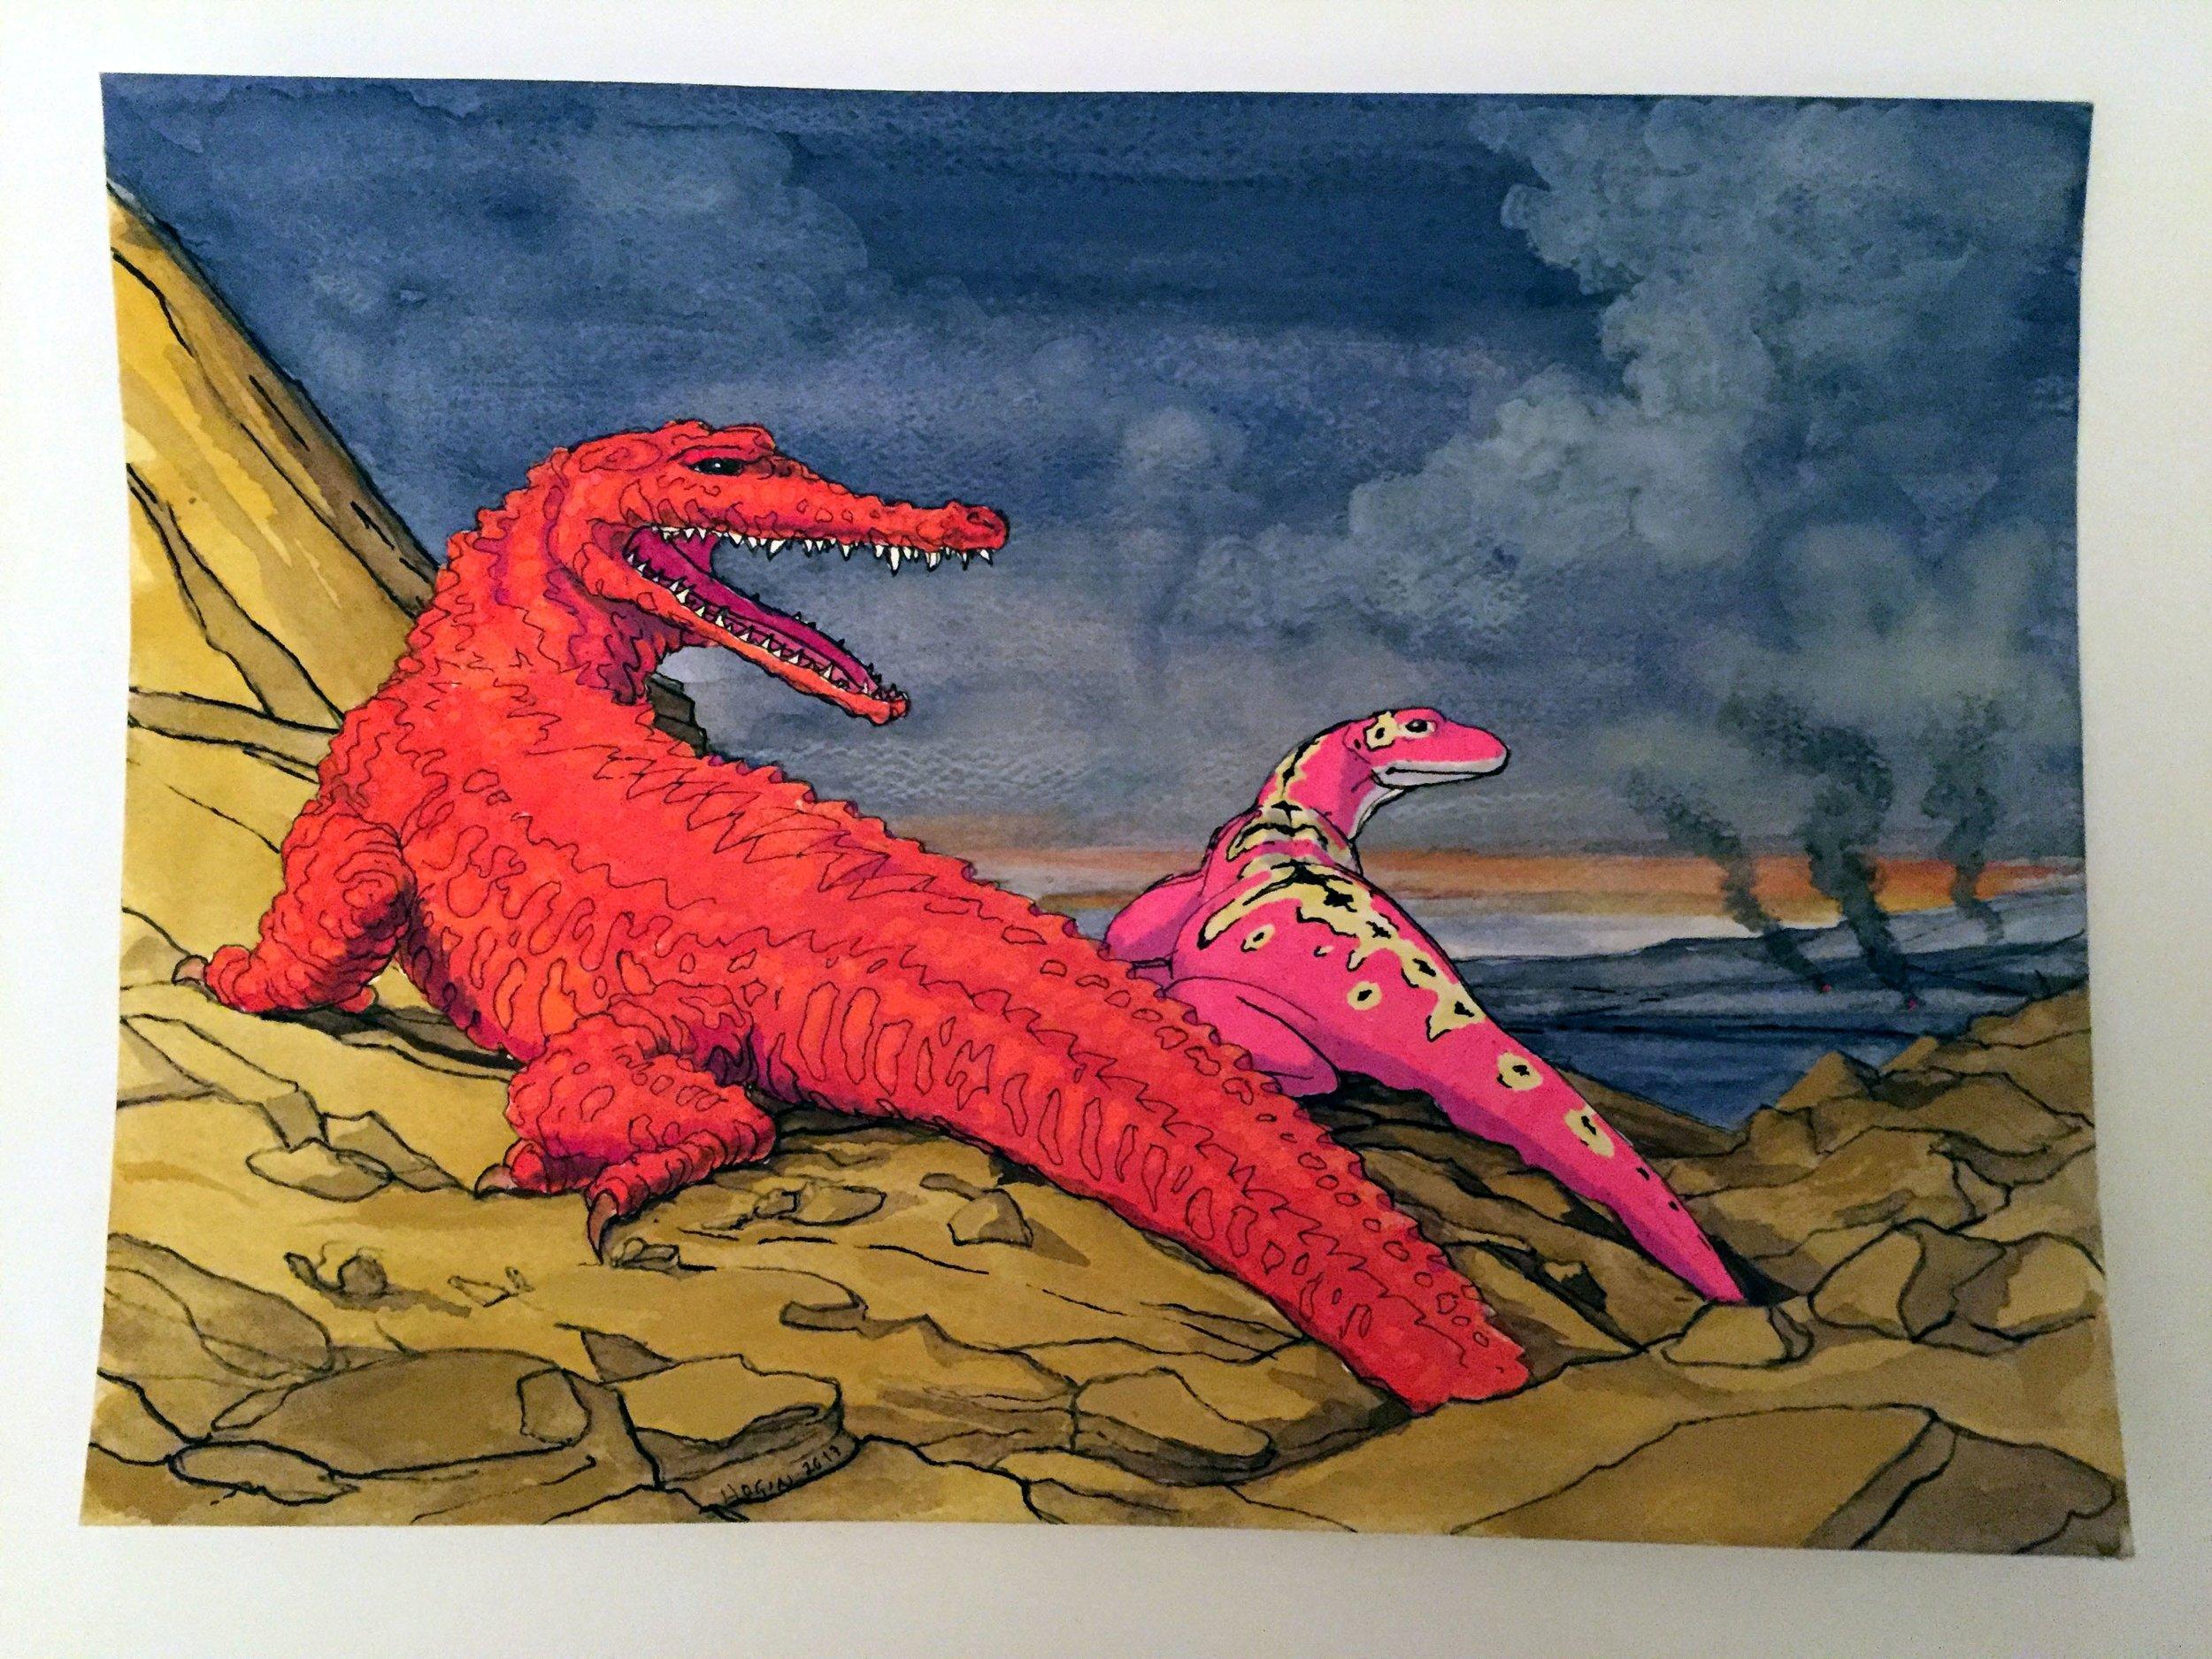 Reality Comix Habitat Diorama with Fire-Skinned Alligator